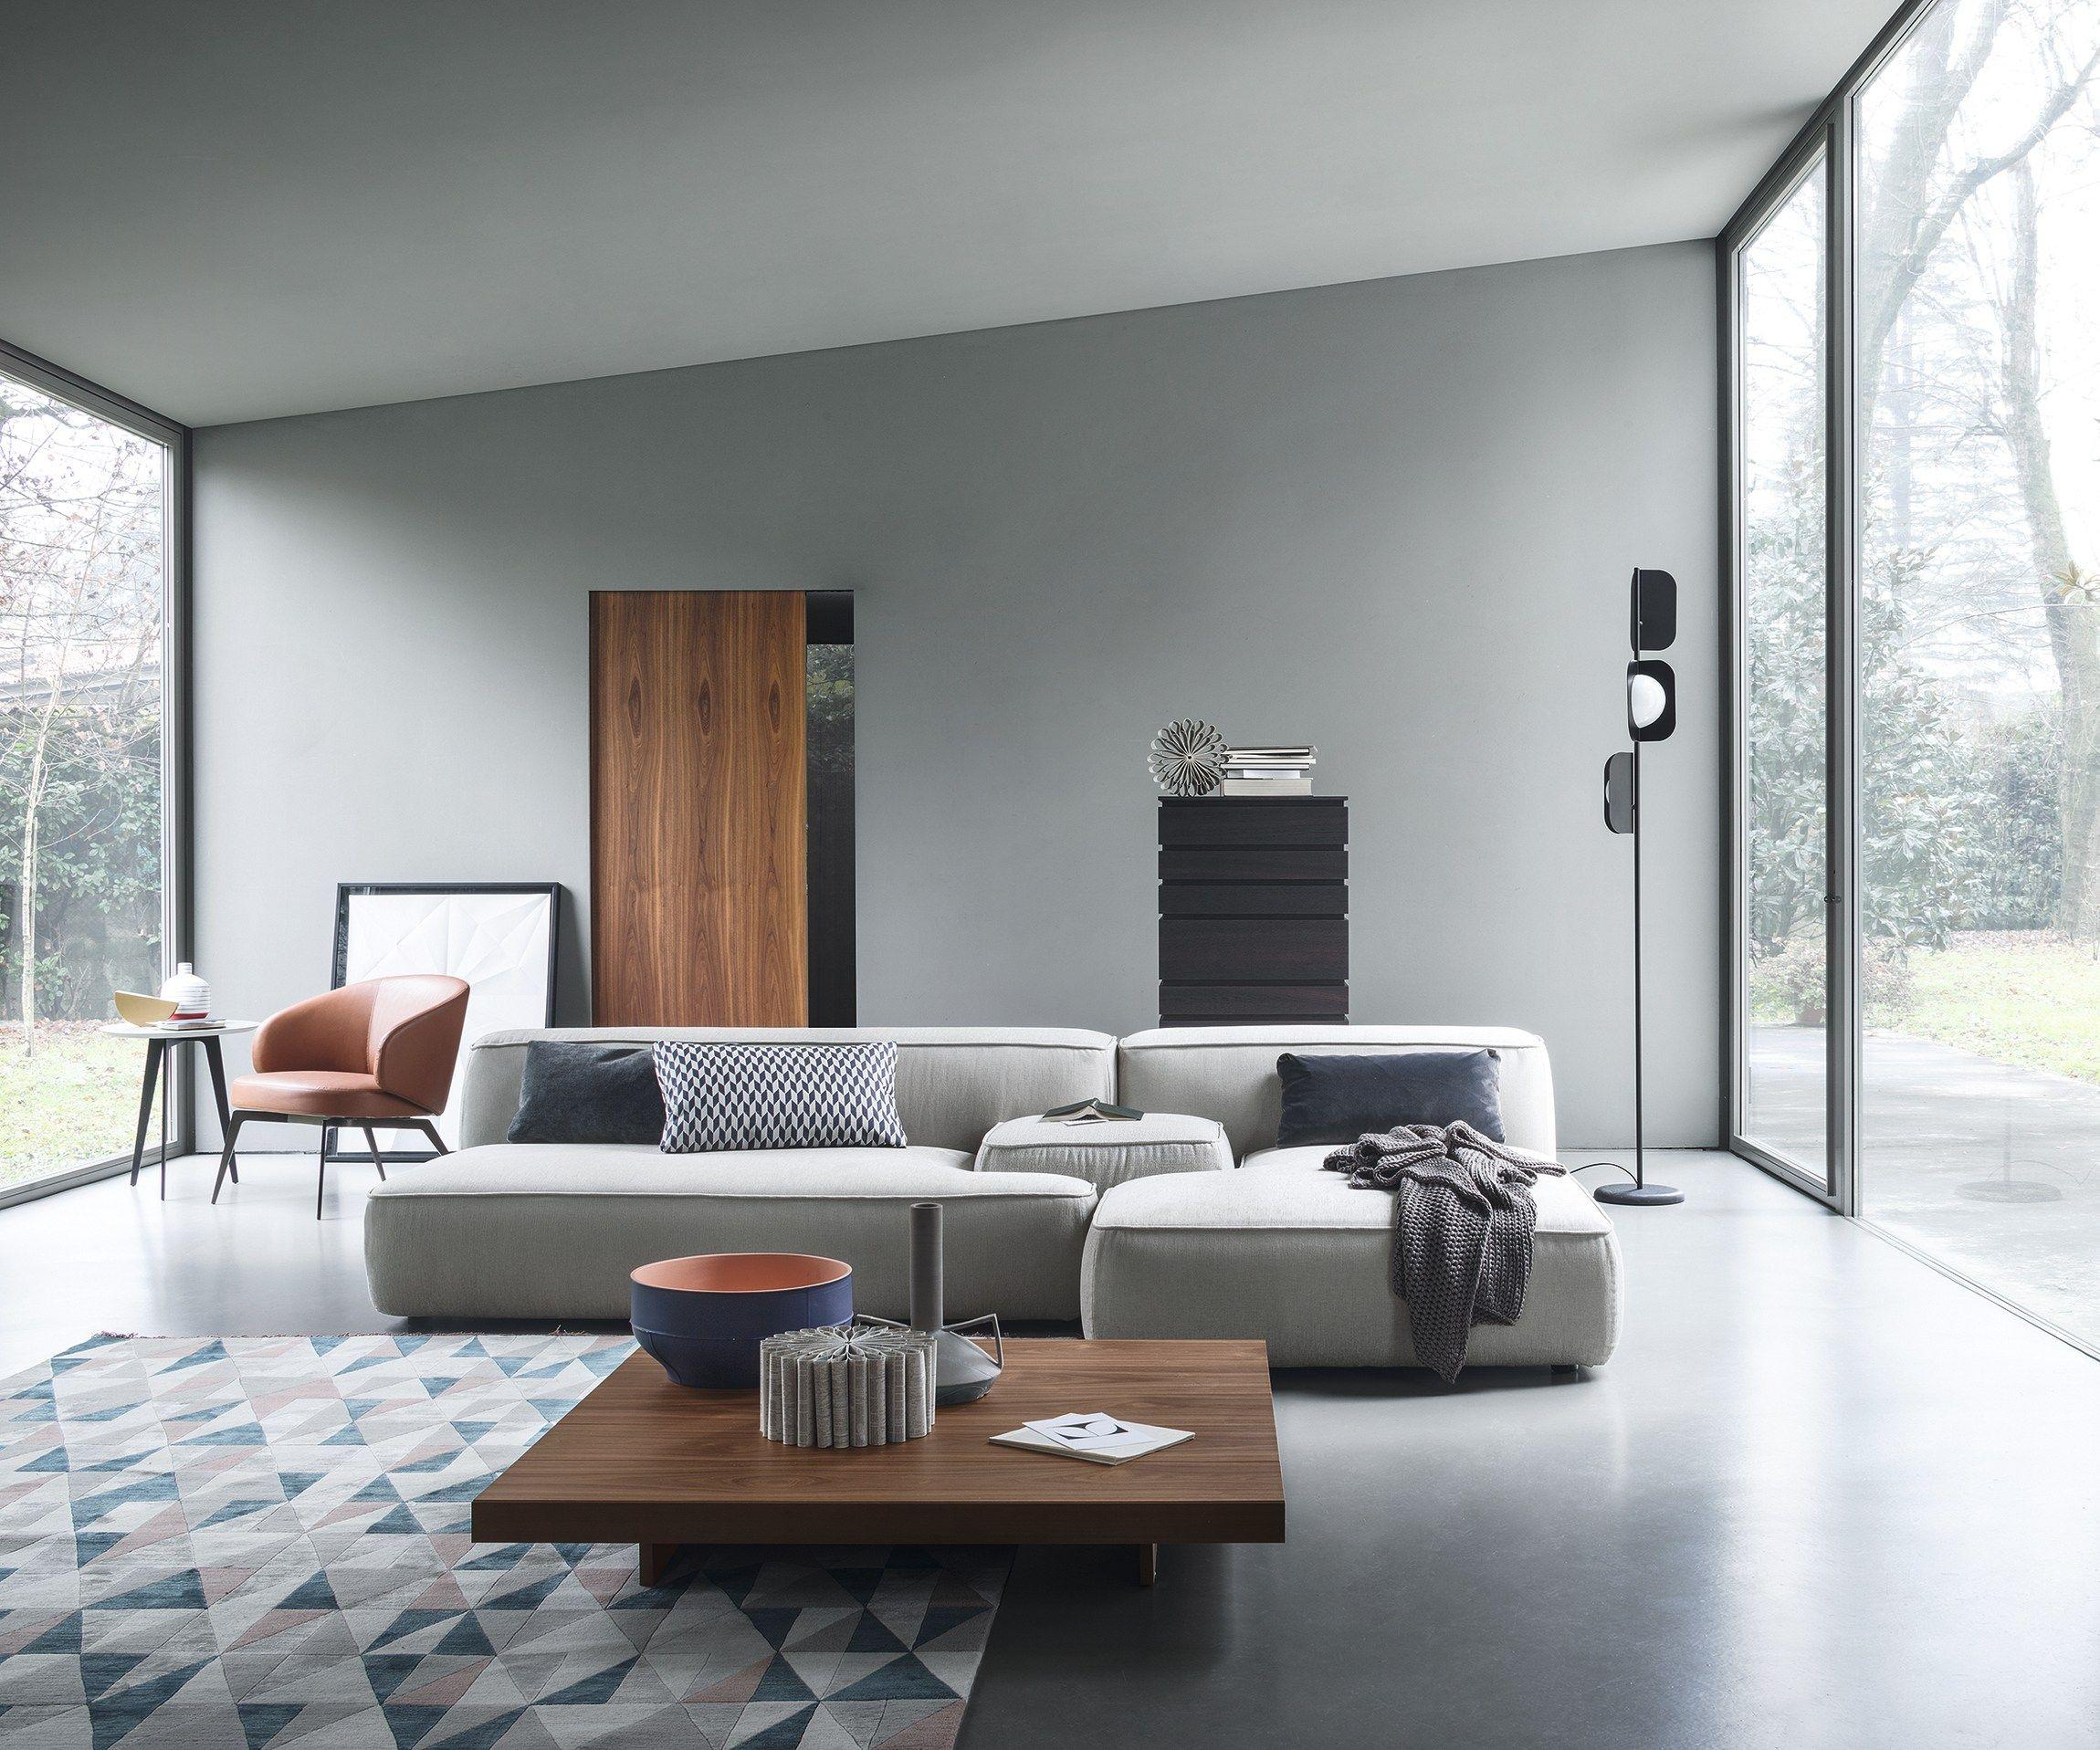 Design Lovers: Neowall Sofa Designed By Piero Lissoni For Living Divani Now  On Display At GRAYE Winter 2015 | GRAYE Showroom Installations | Pinterest  ...